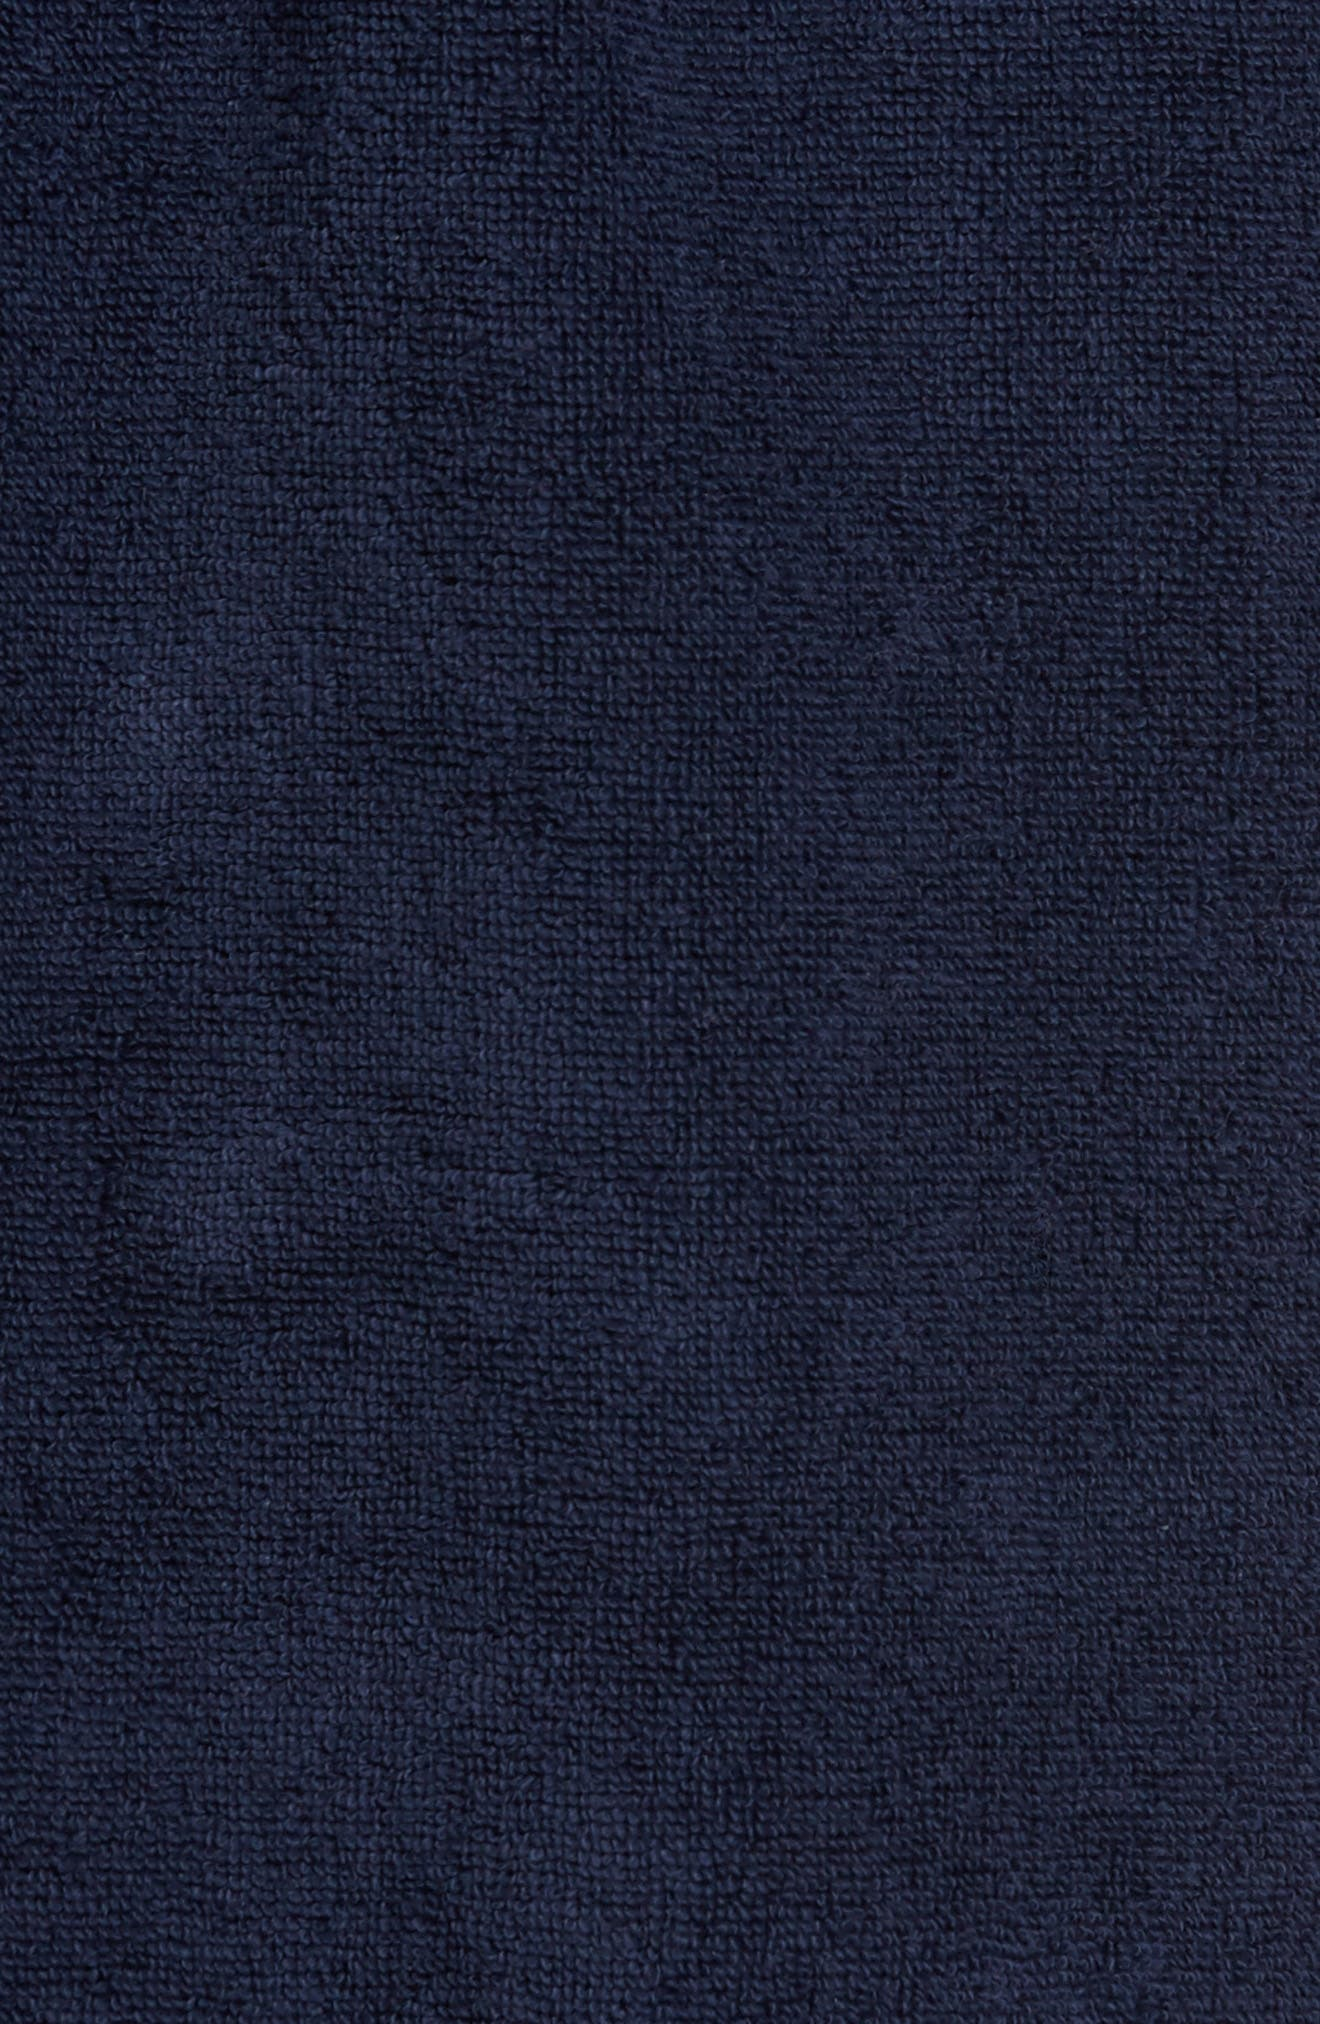 Hydro Cotton Terry Robe,                             Alternate thumbnail 5, color,                             NAVY